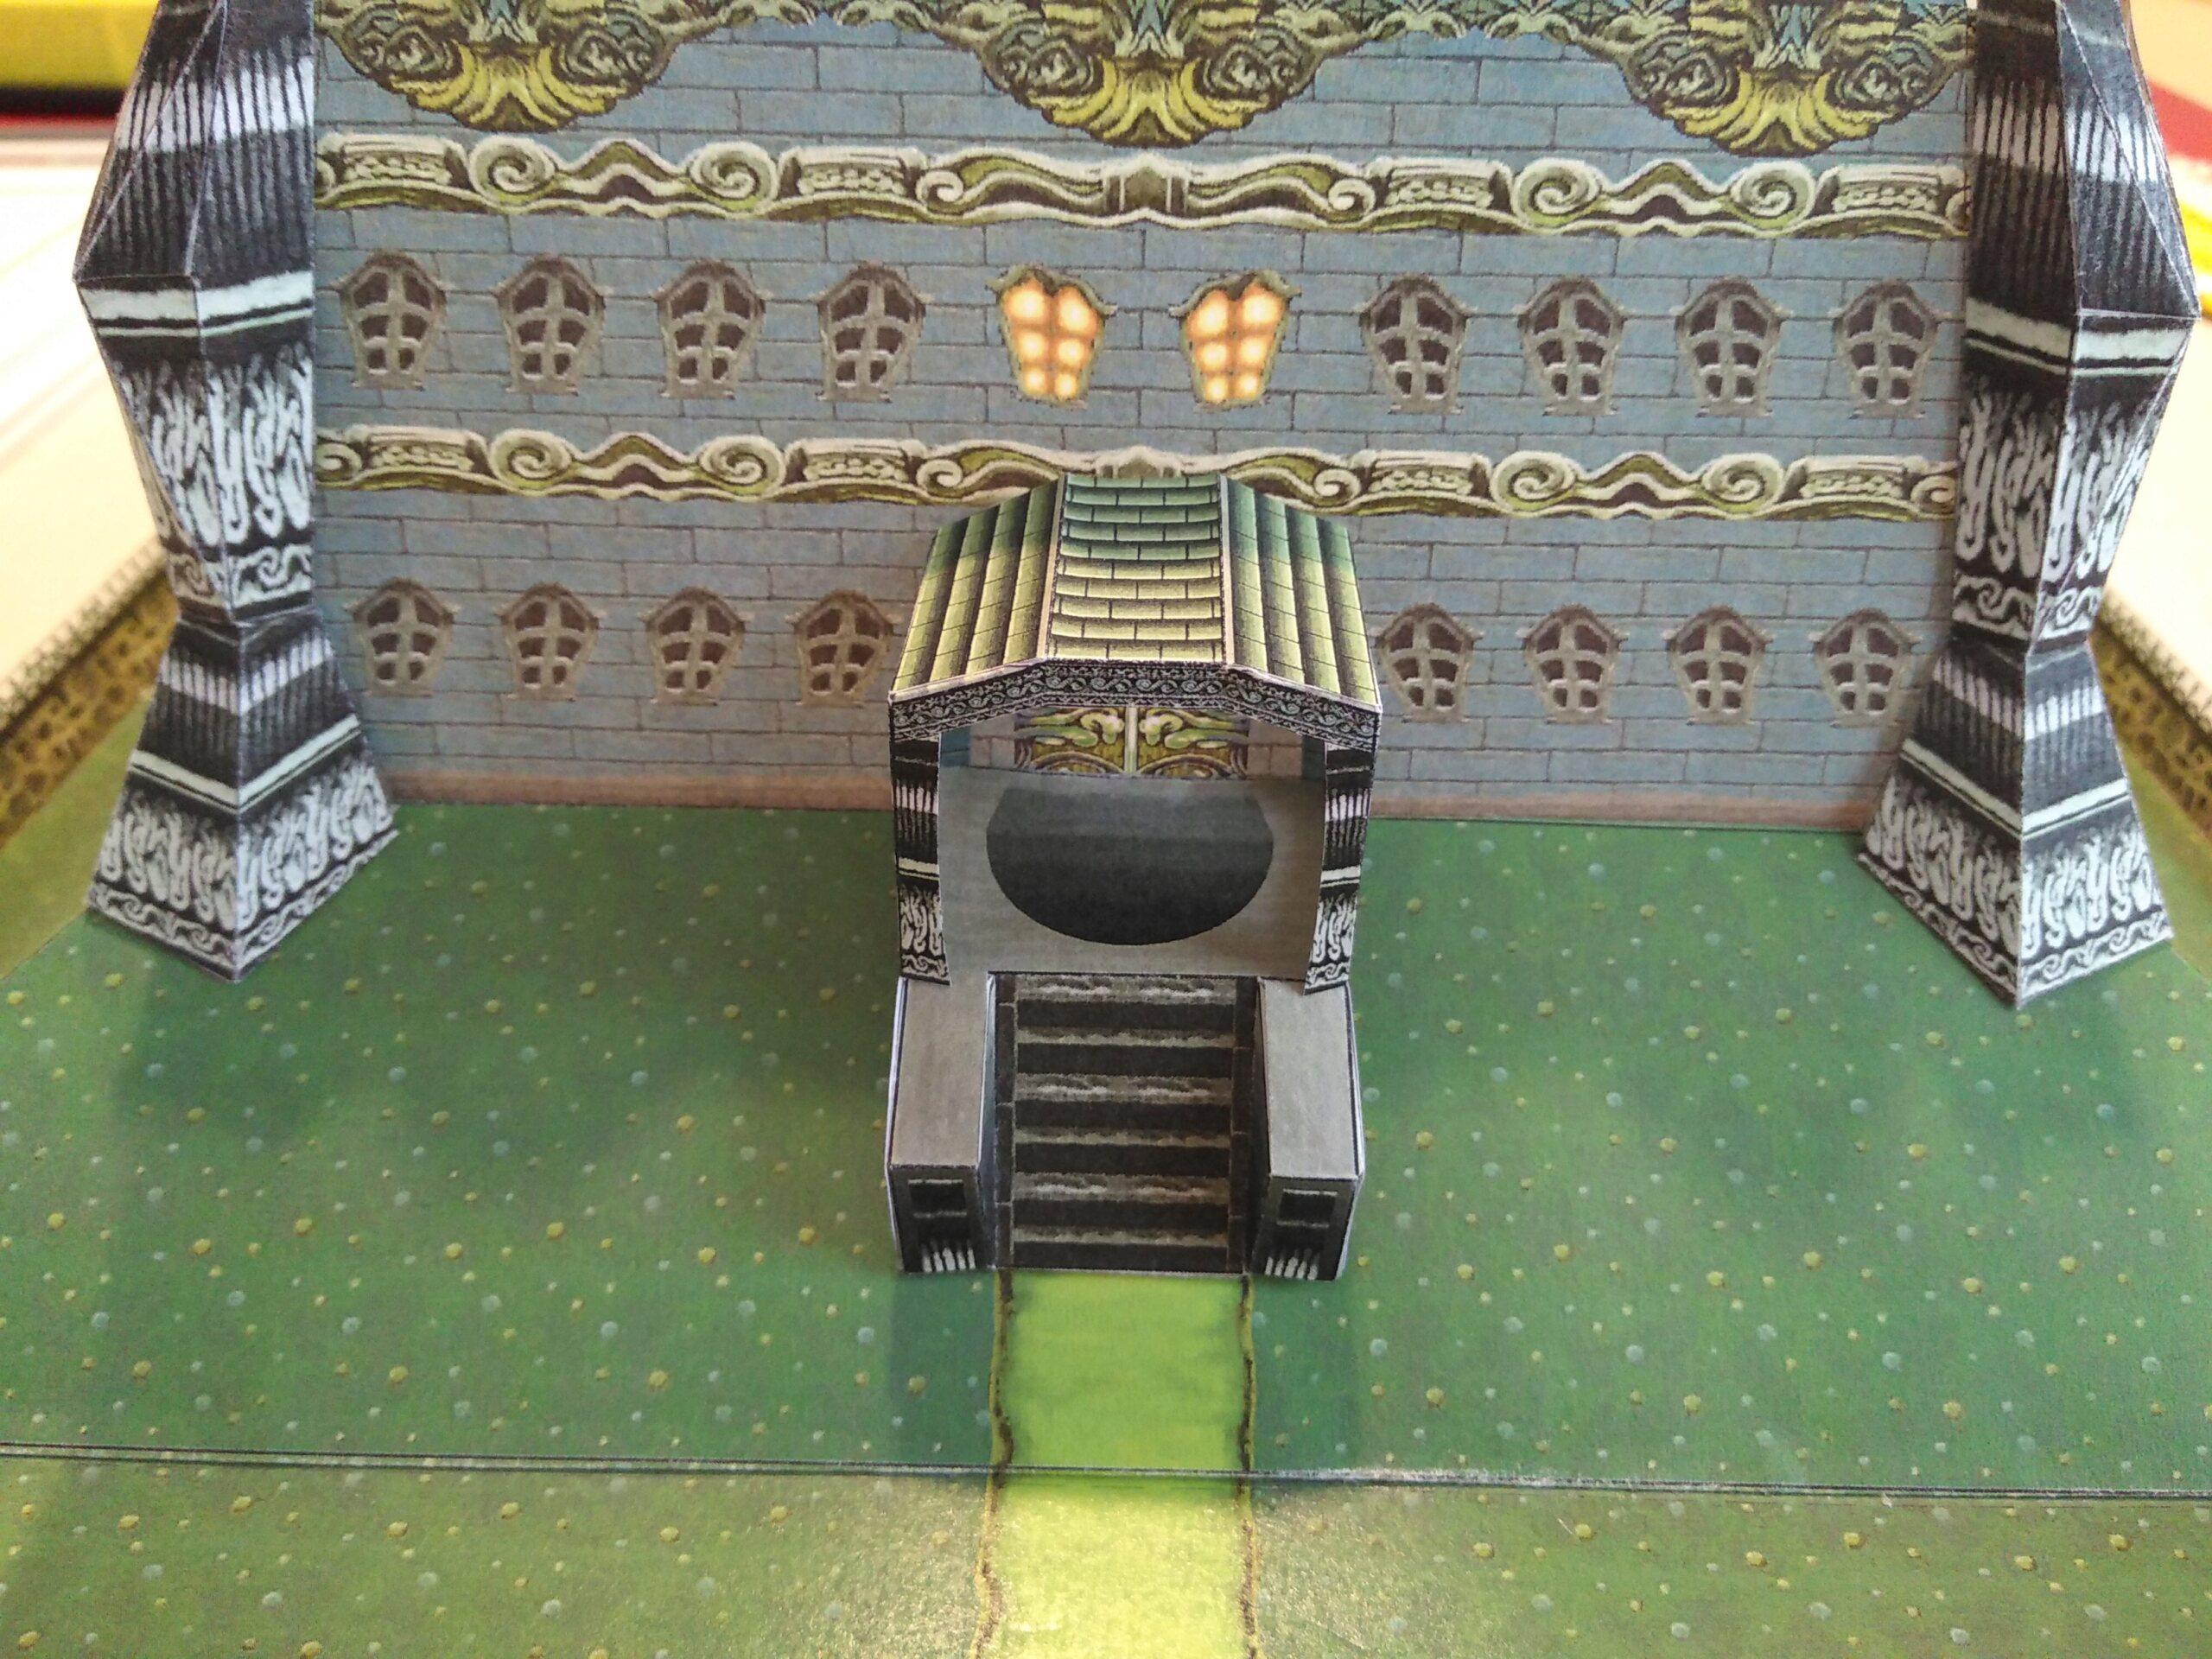 Luigi's Mansion - Die Gruselvilla aus dem Gamecube-Klassiker Img_2030